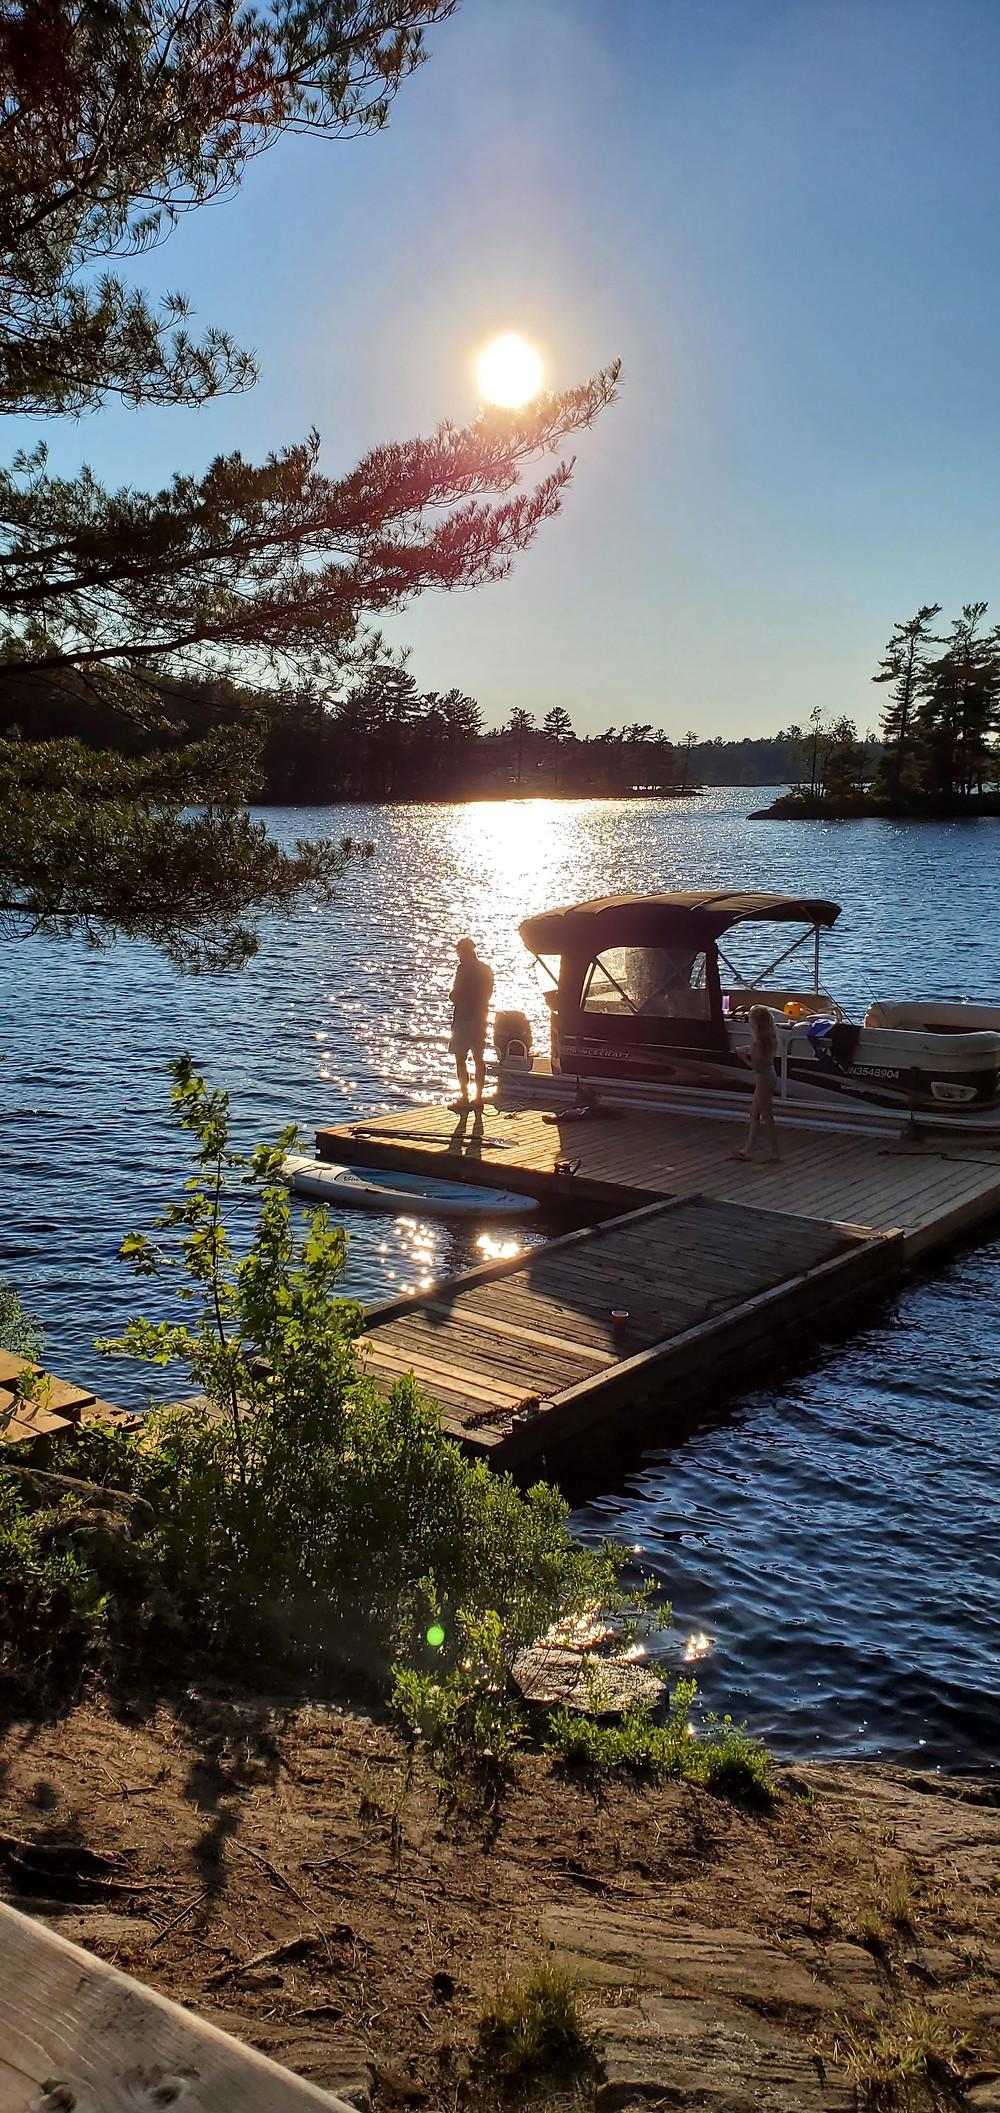 Fishing in the Muskokas Ontario for Bass